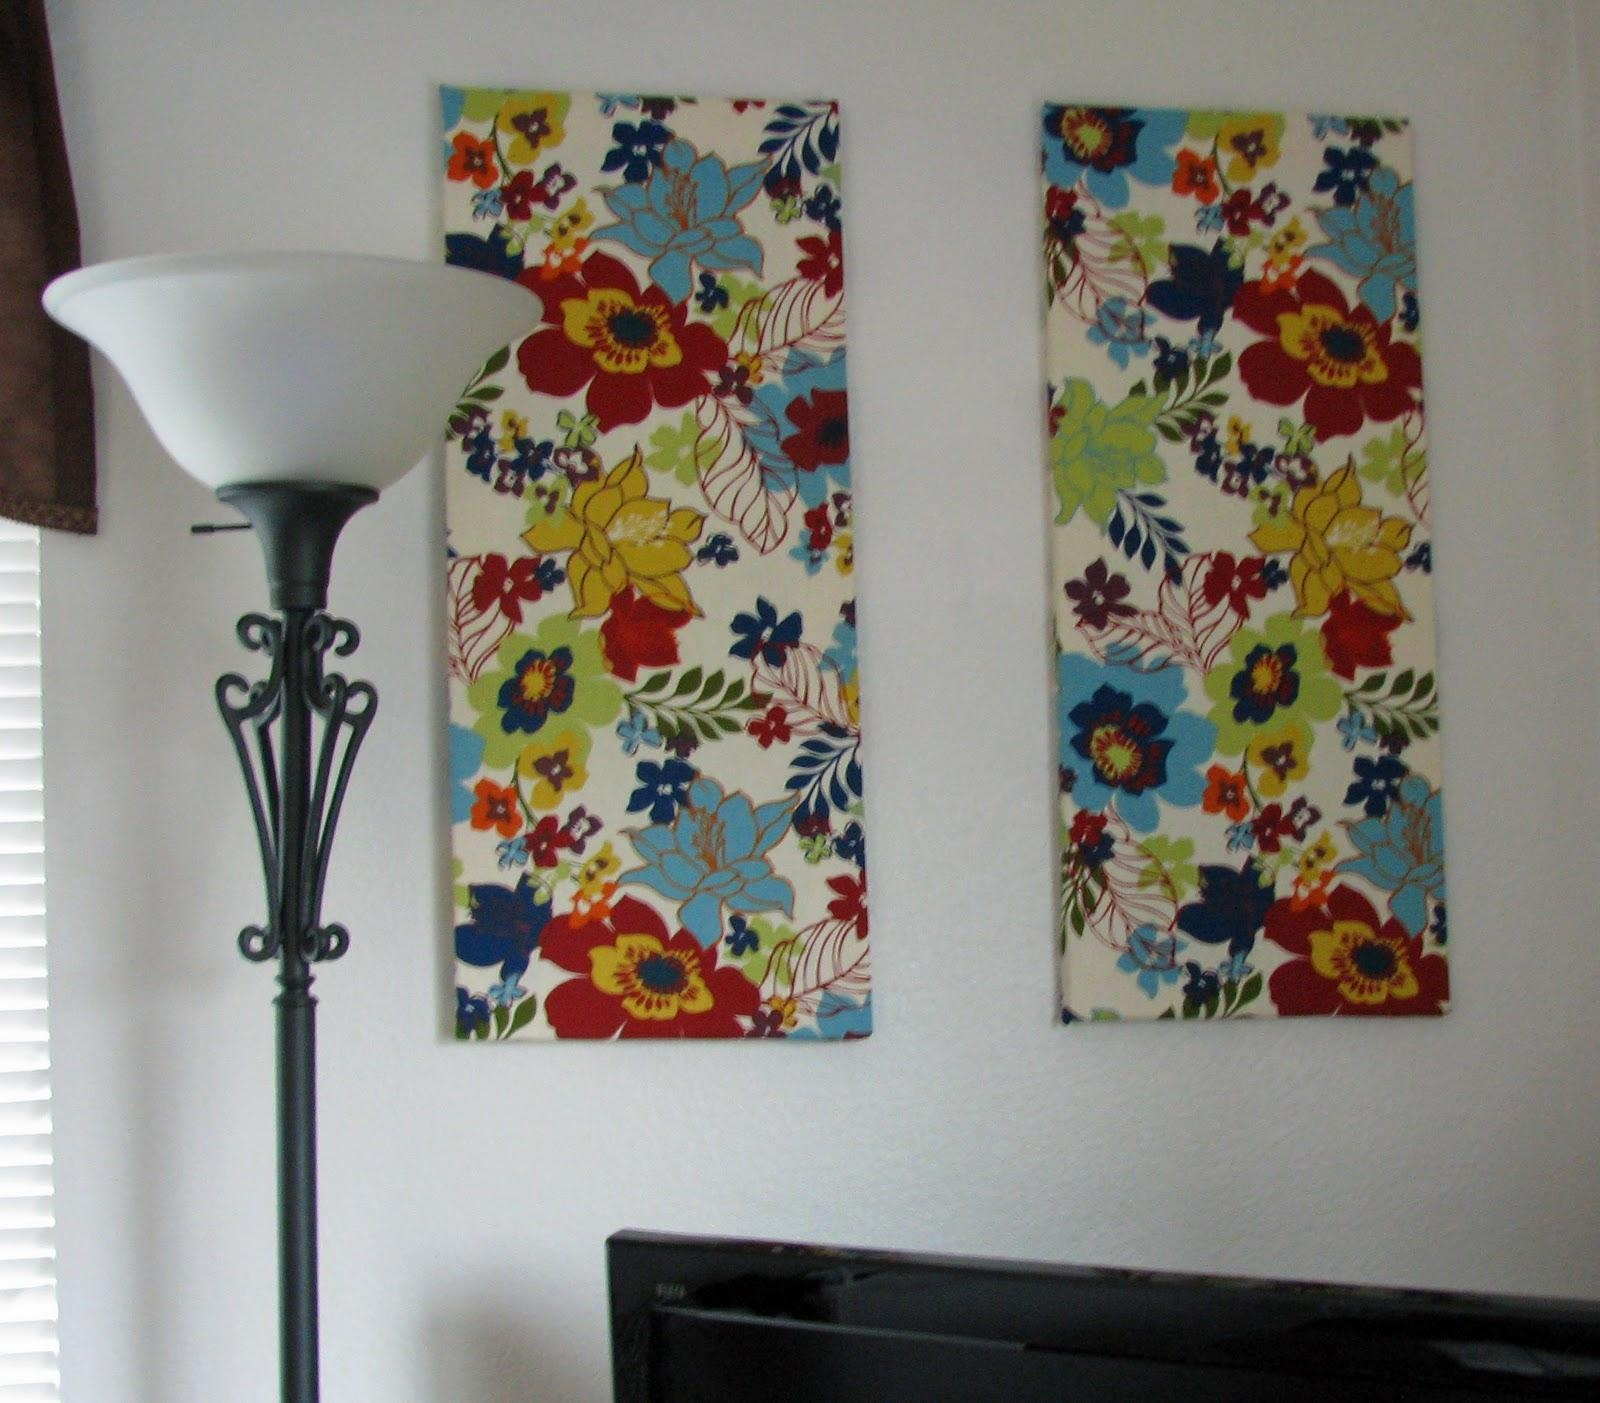 The Closet Domestic: Hiding White Walls: Fabric Wall Art Regarding Fabric Wall Art (Image 19 of 20)